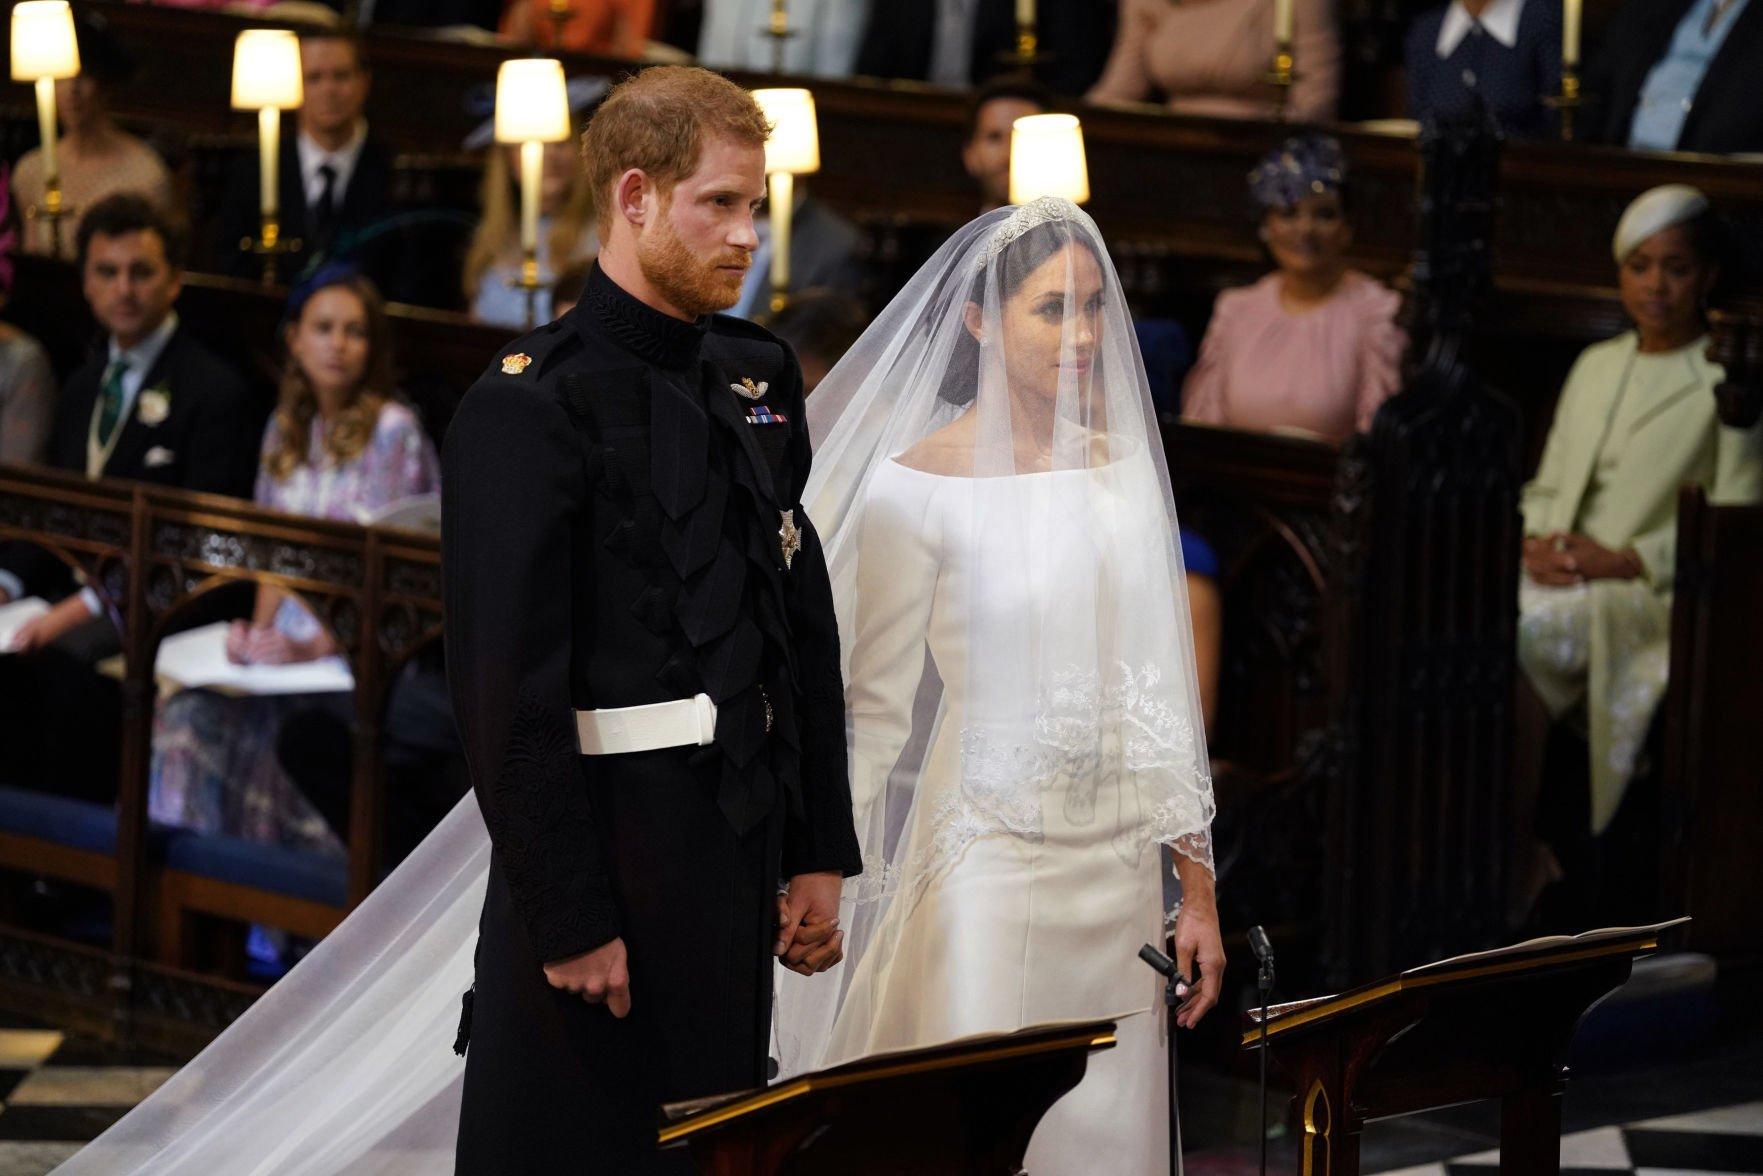 Britain Royal Wedding Prince Harry Meghan Markle